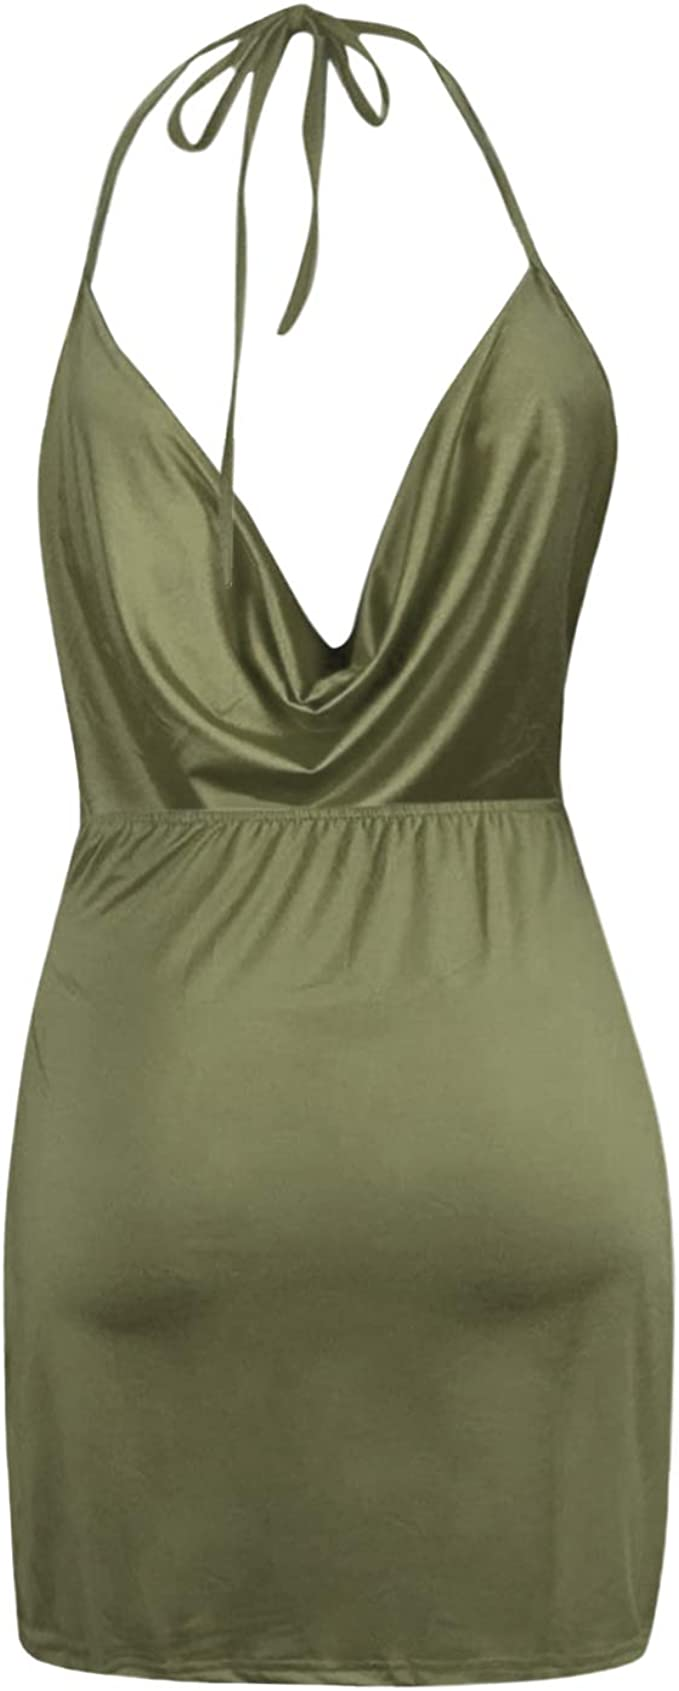 XXBlosom Womens Bodycon Sleeveless Halter Clubwear Backless Cut Out Party Mini Dress